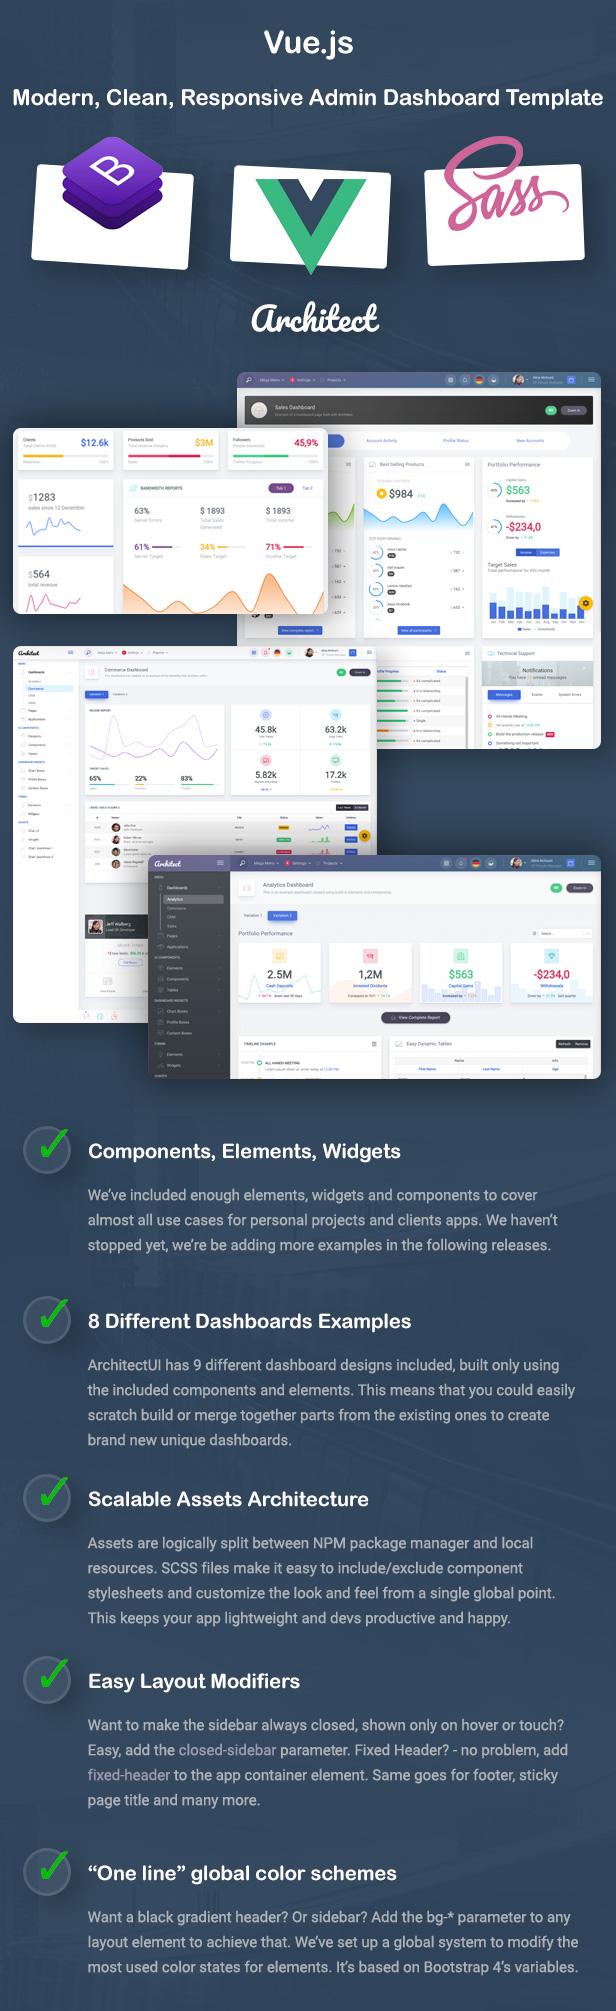 ArchitectUI - Vue.js Bootstrap Admin UI Dashboard Template - 4